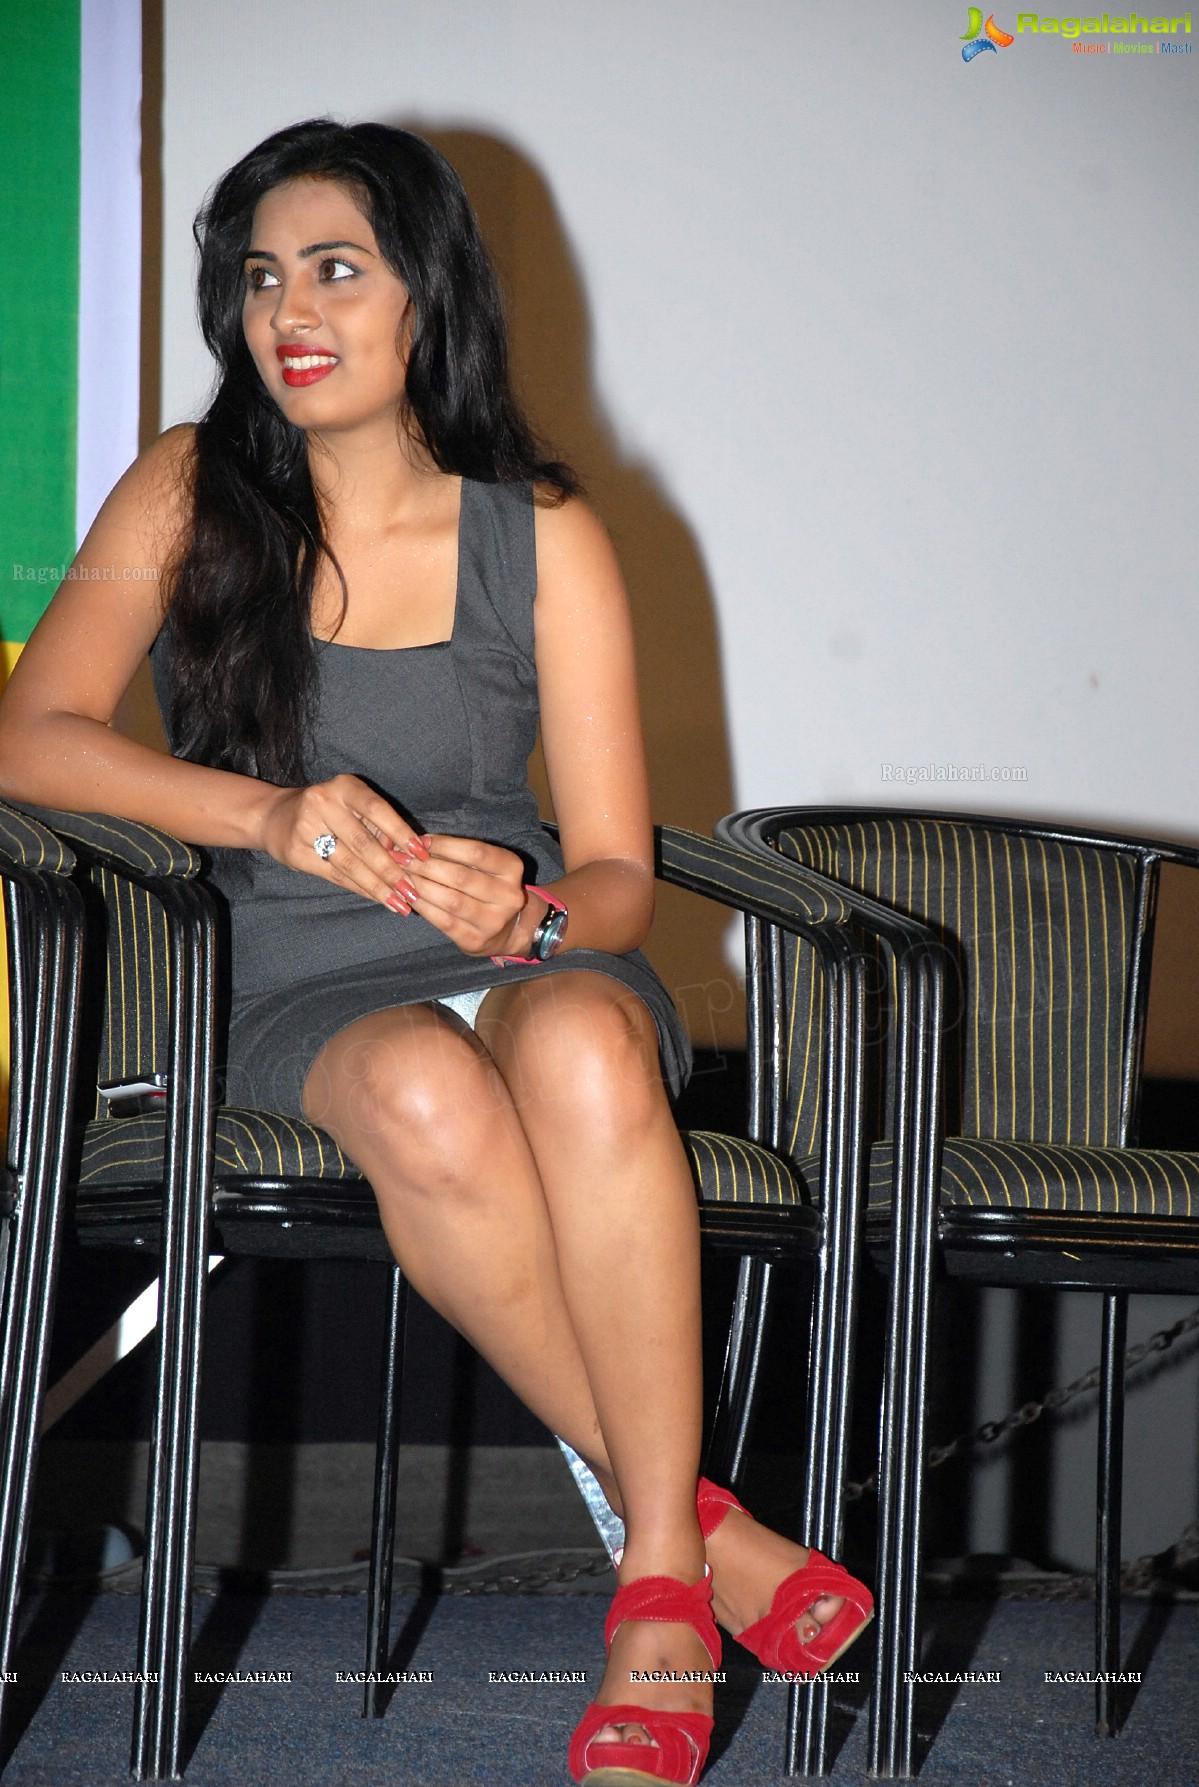 street girl sex naked video aishwarya free